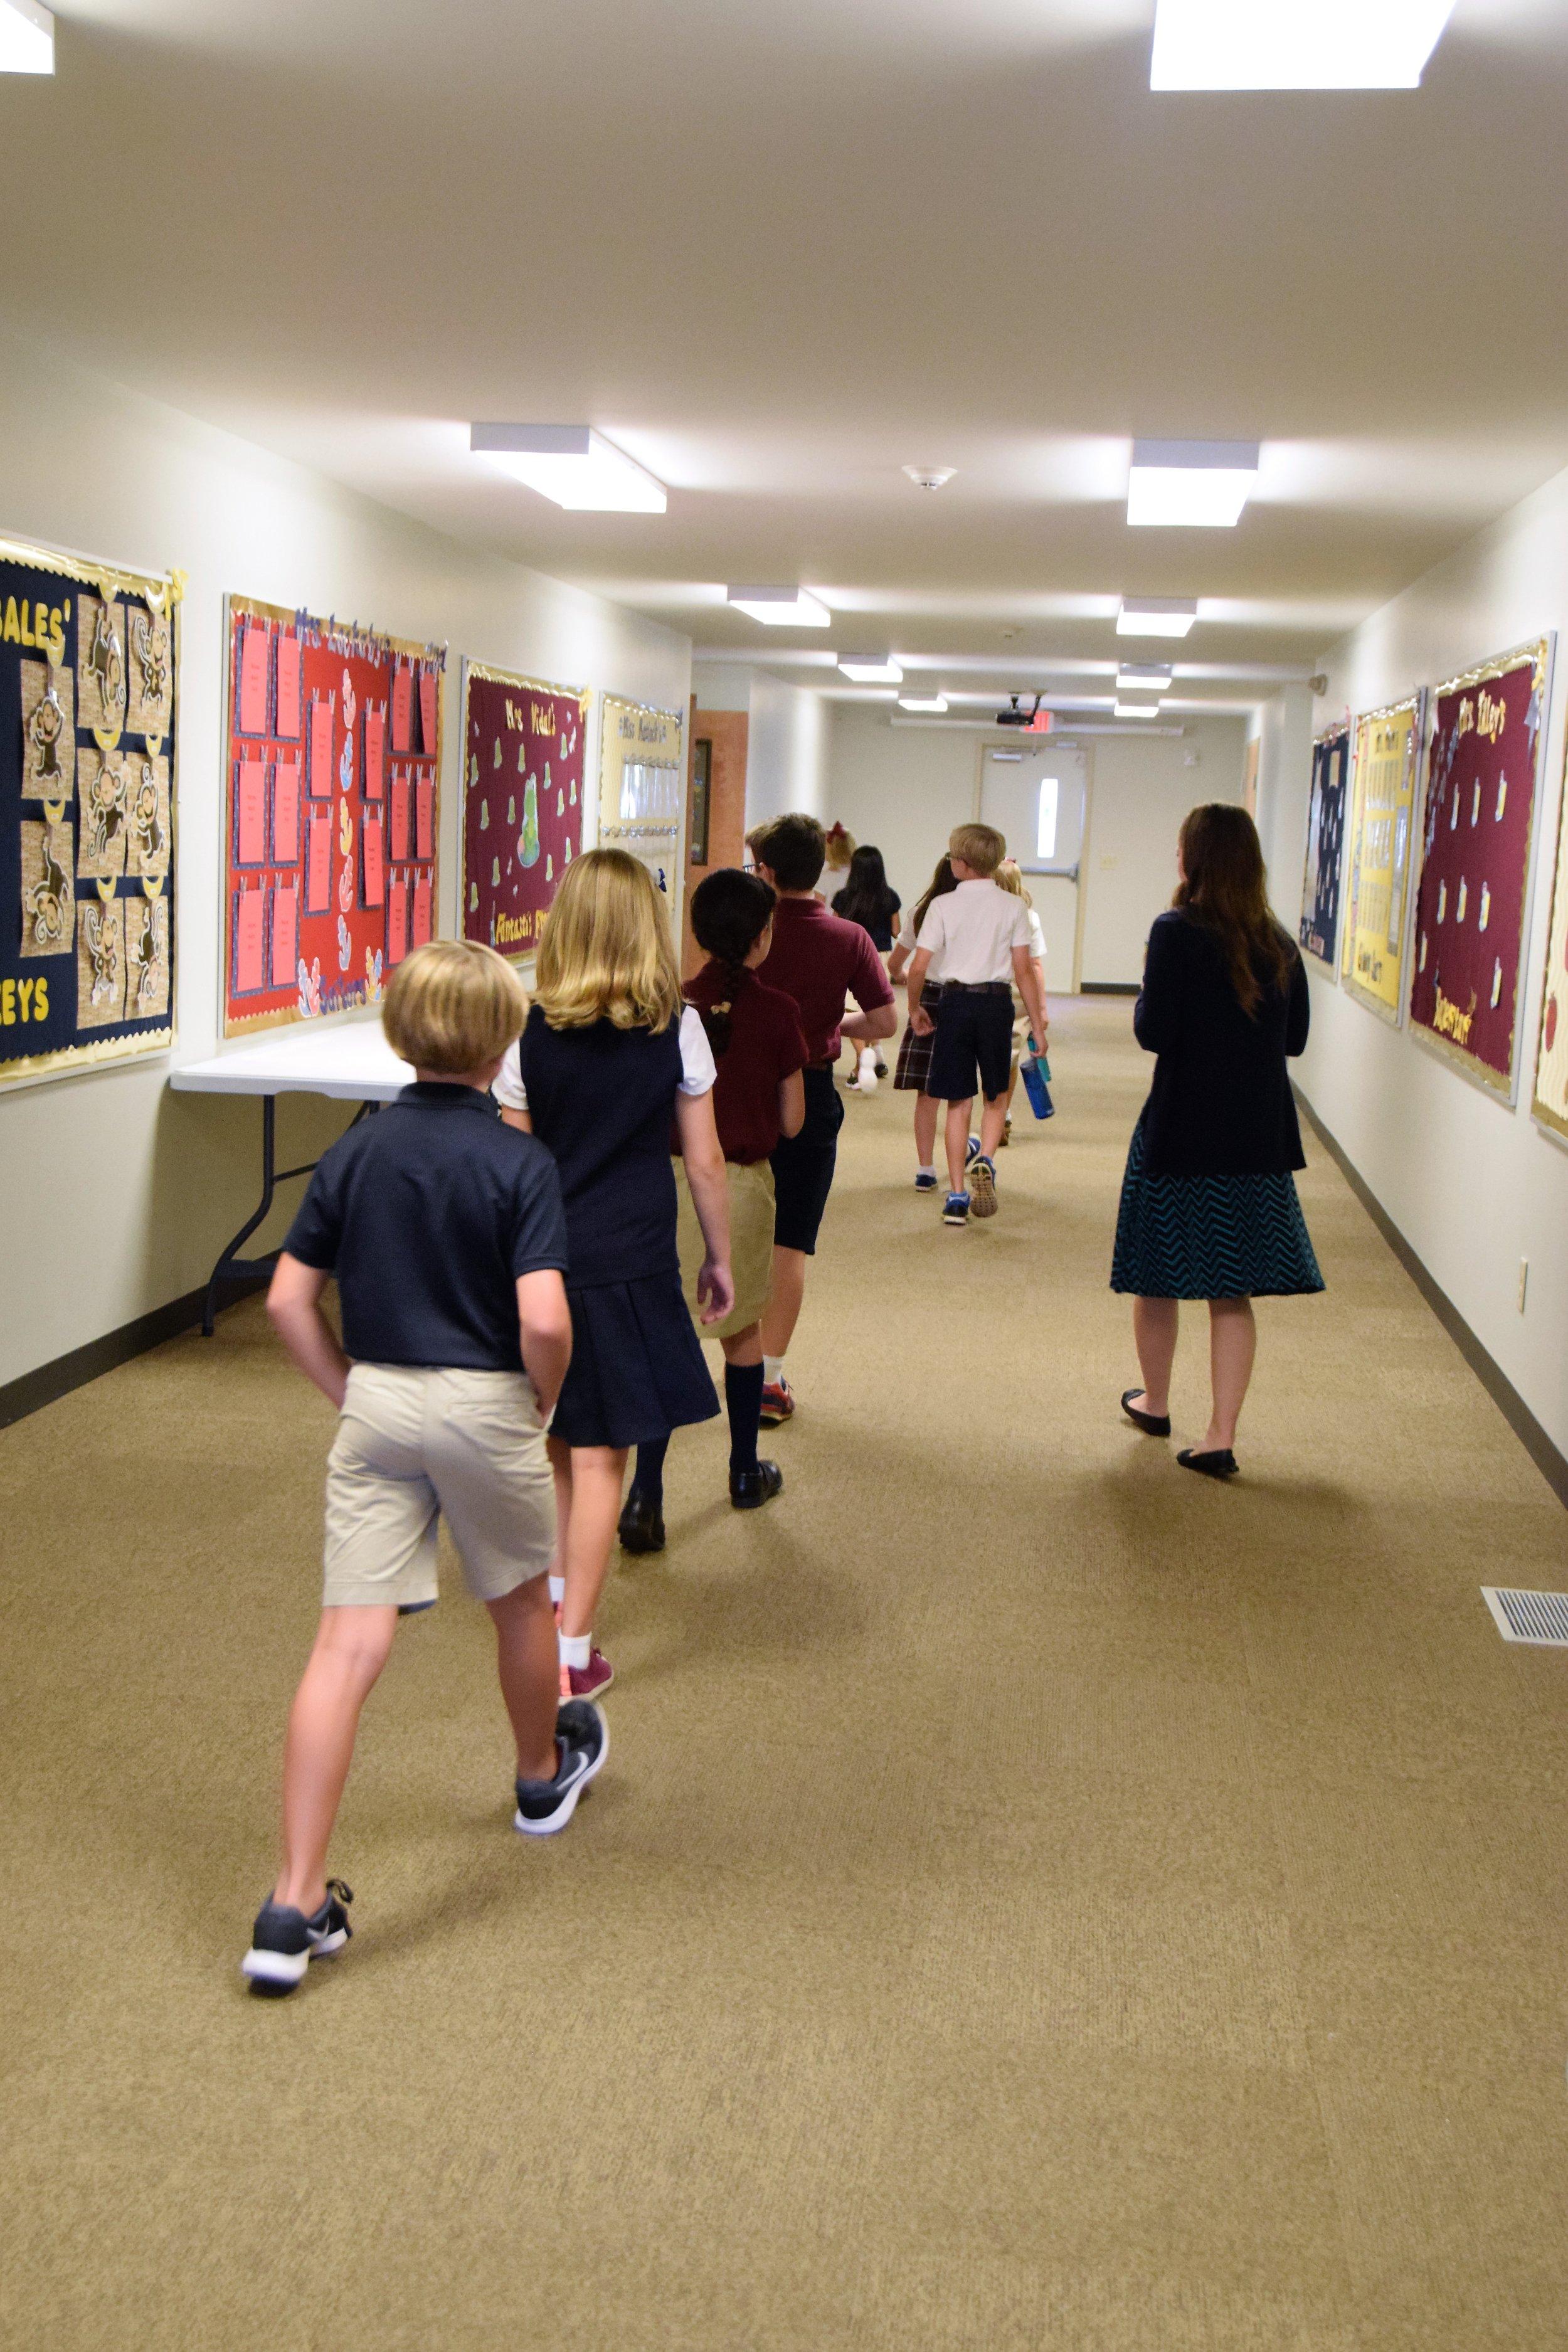 Lower School 1st Day of School 8-23-17 (36).JPG